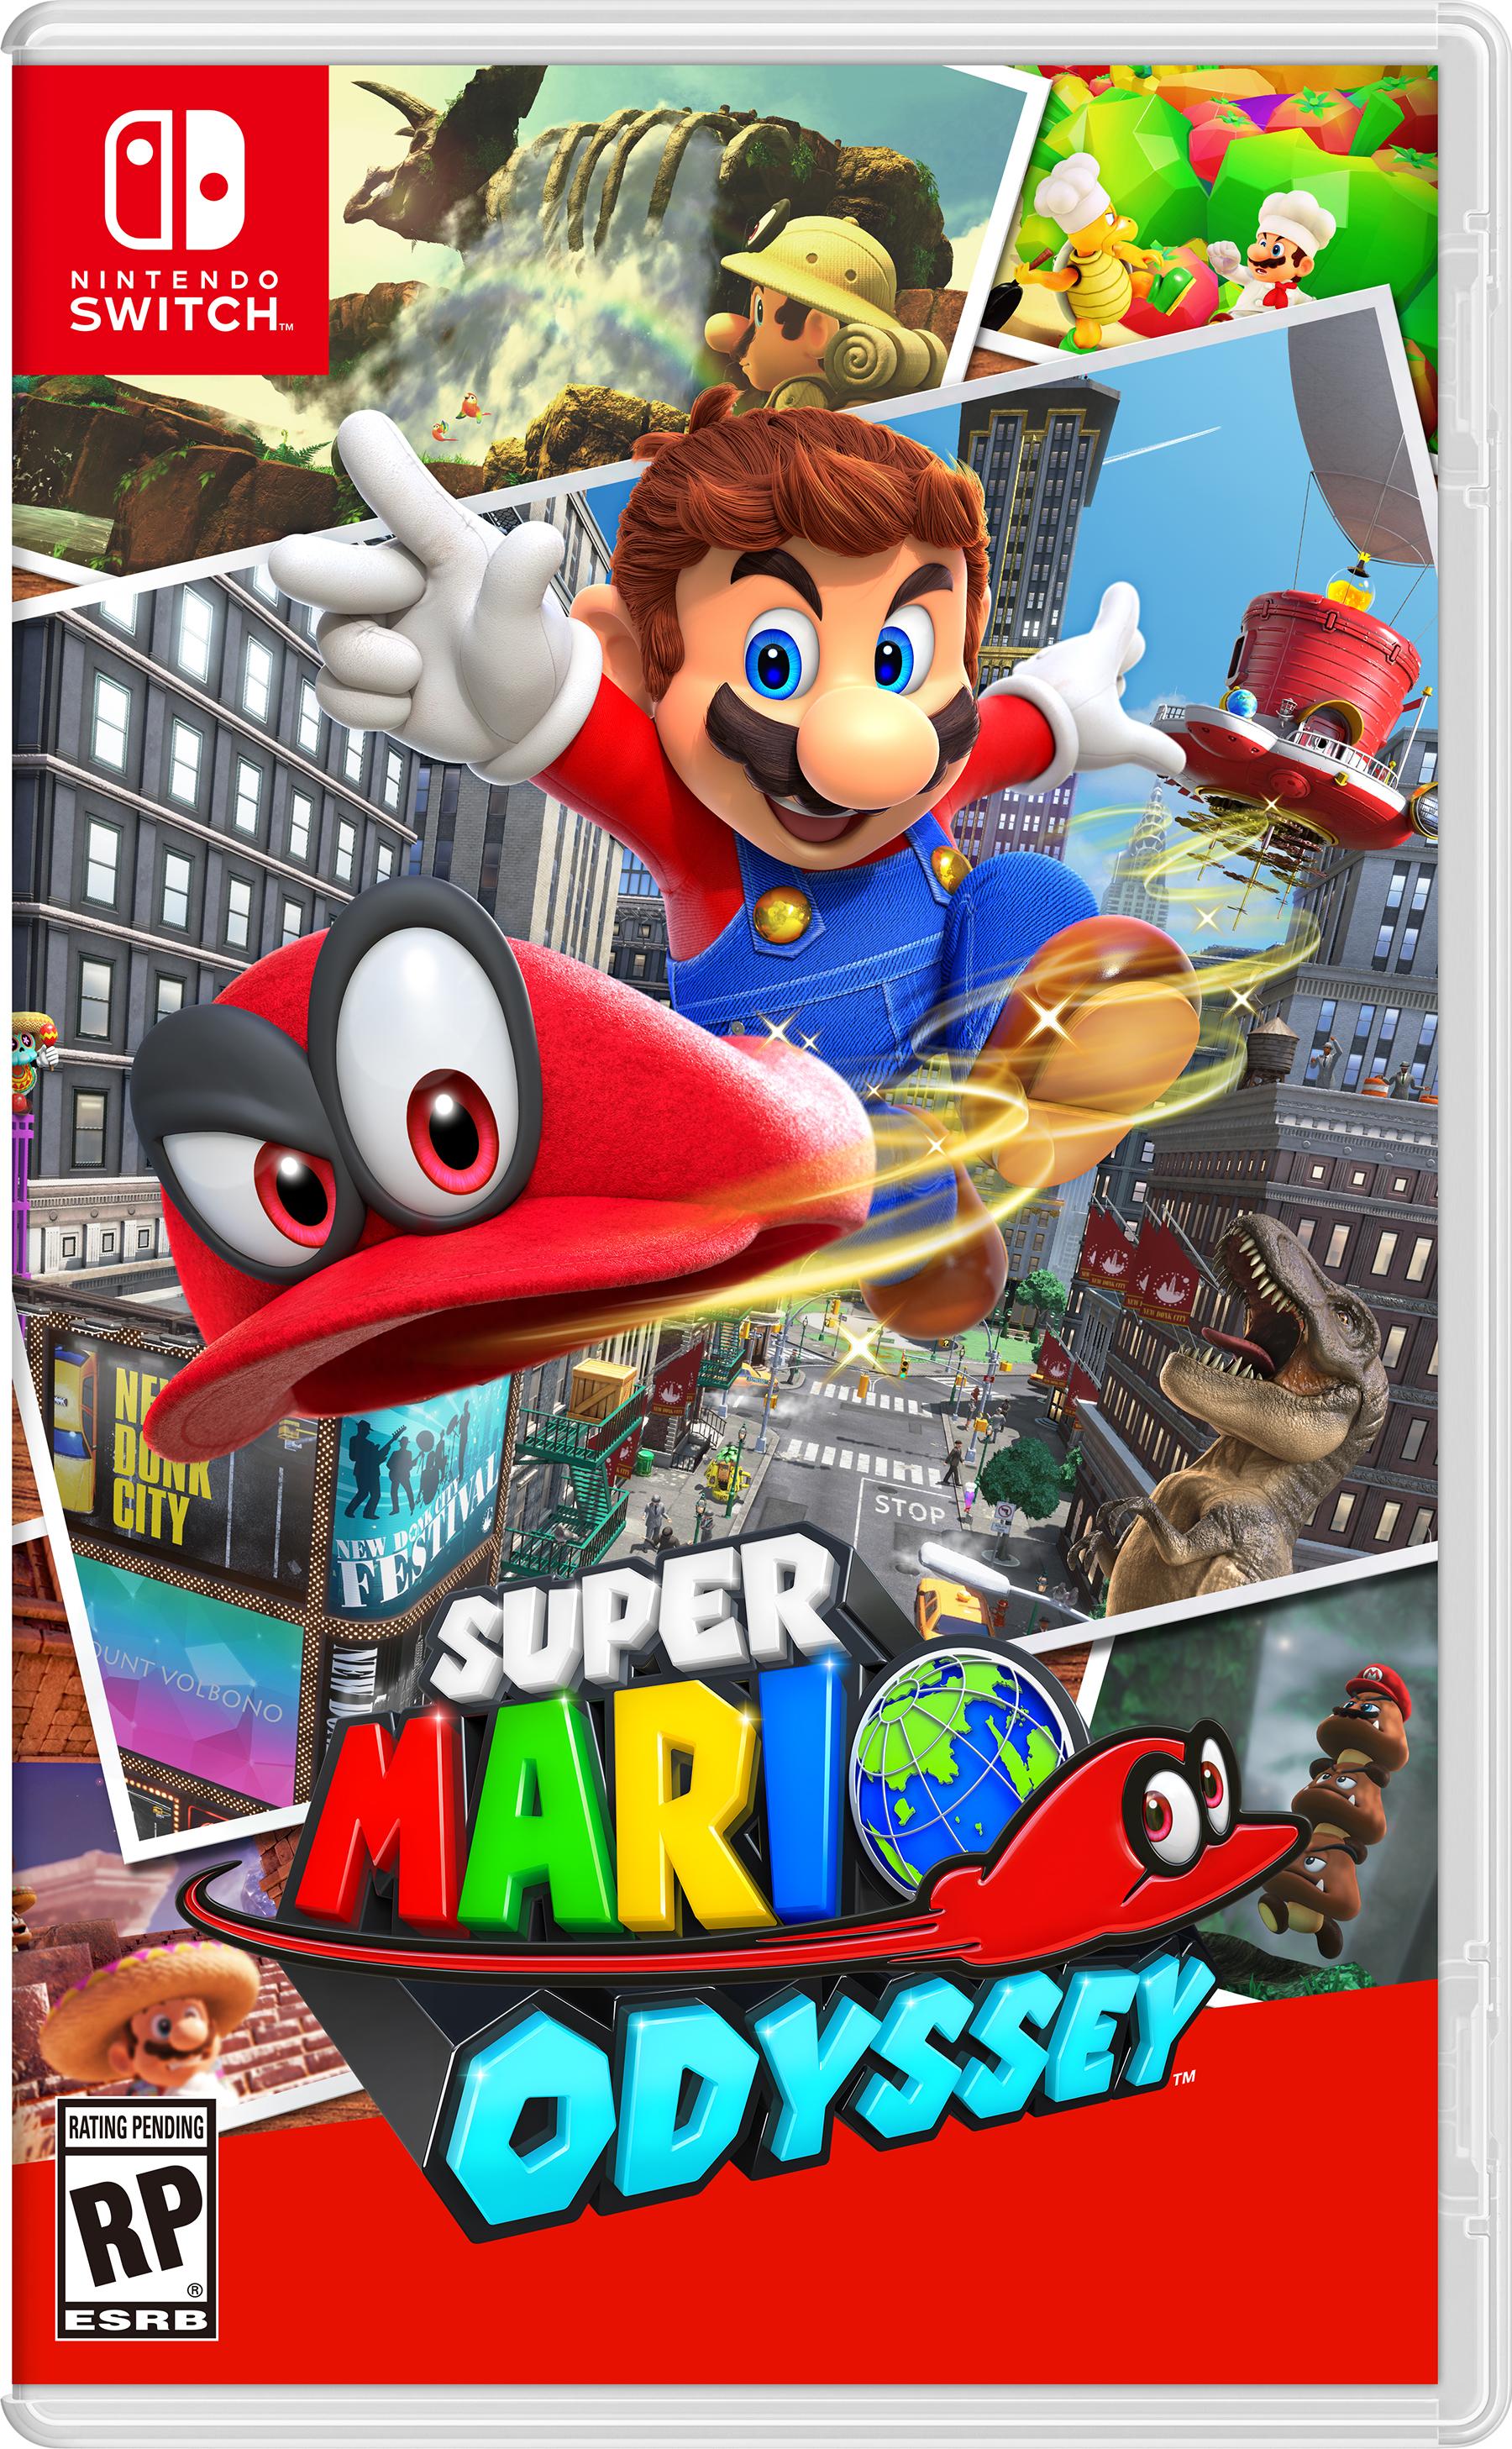 Super Mario Odyssey Screen Box Art